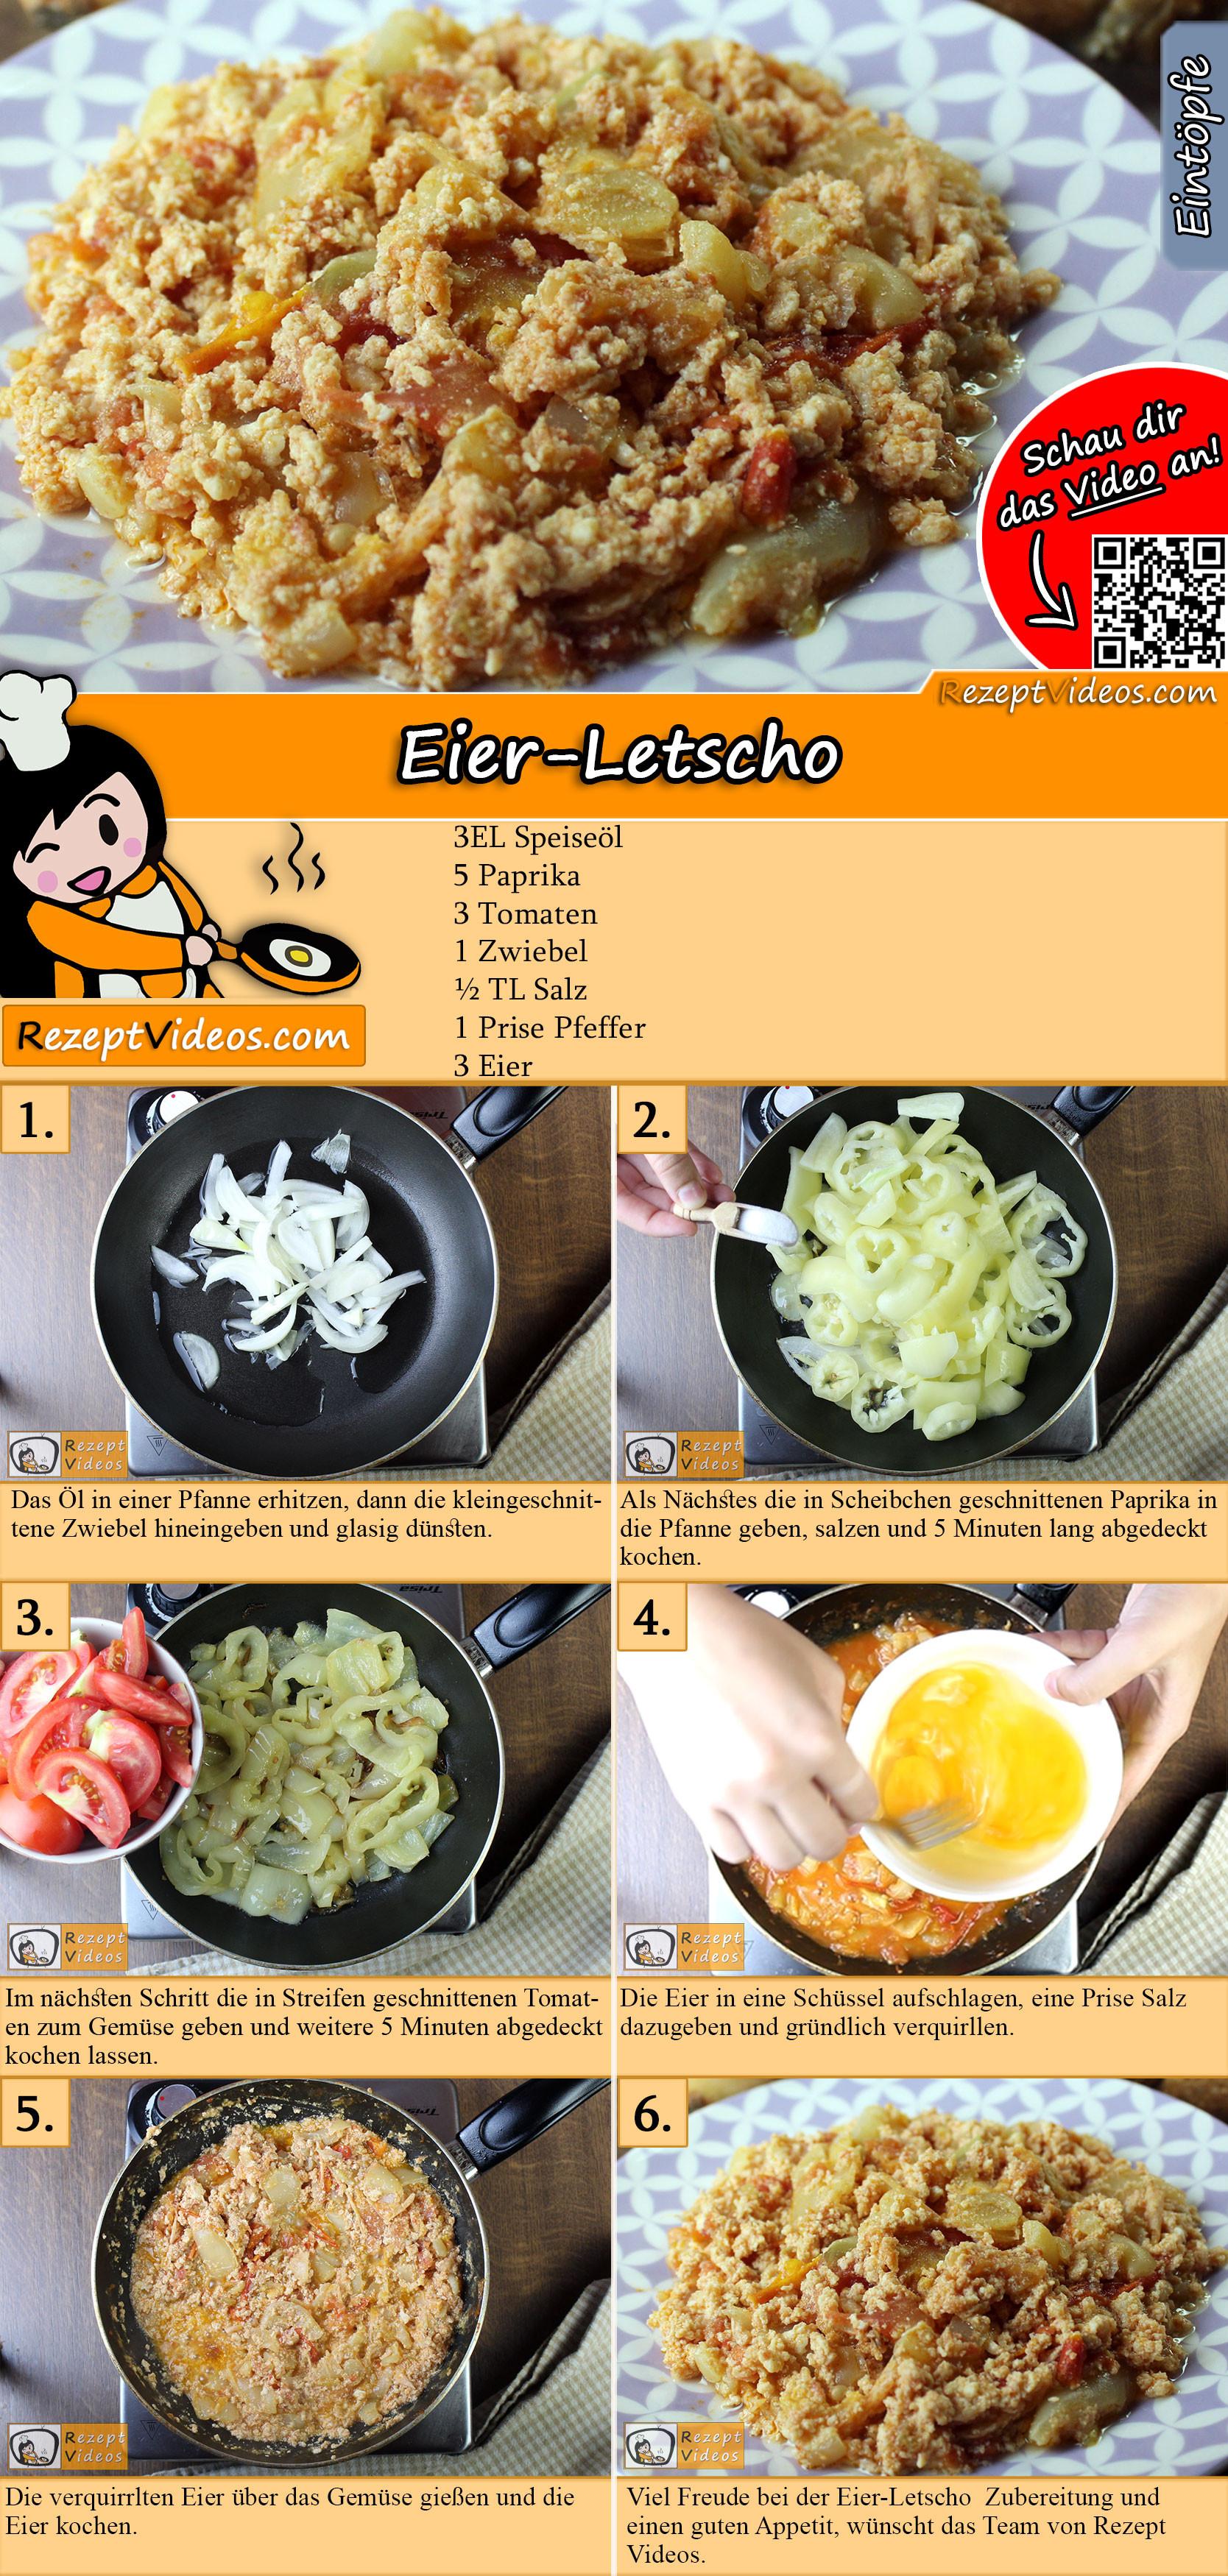 Eier-Letscho Rezept mit Video